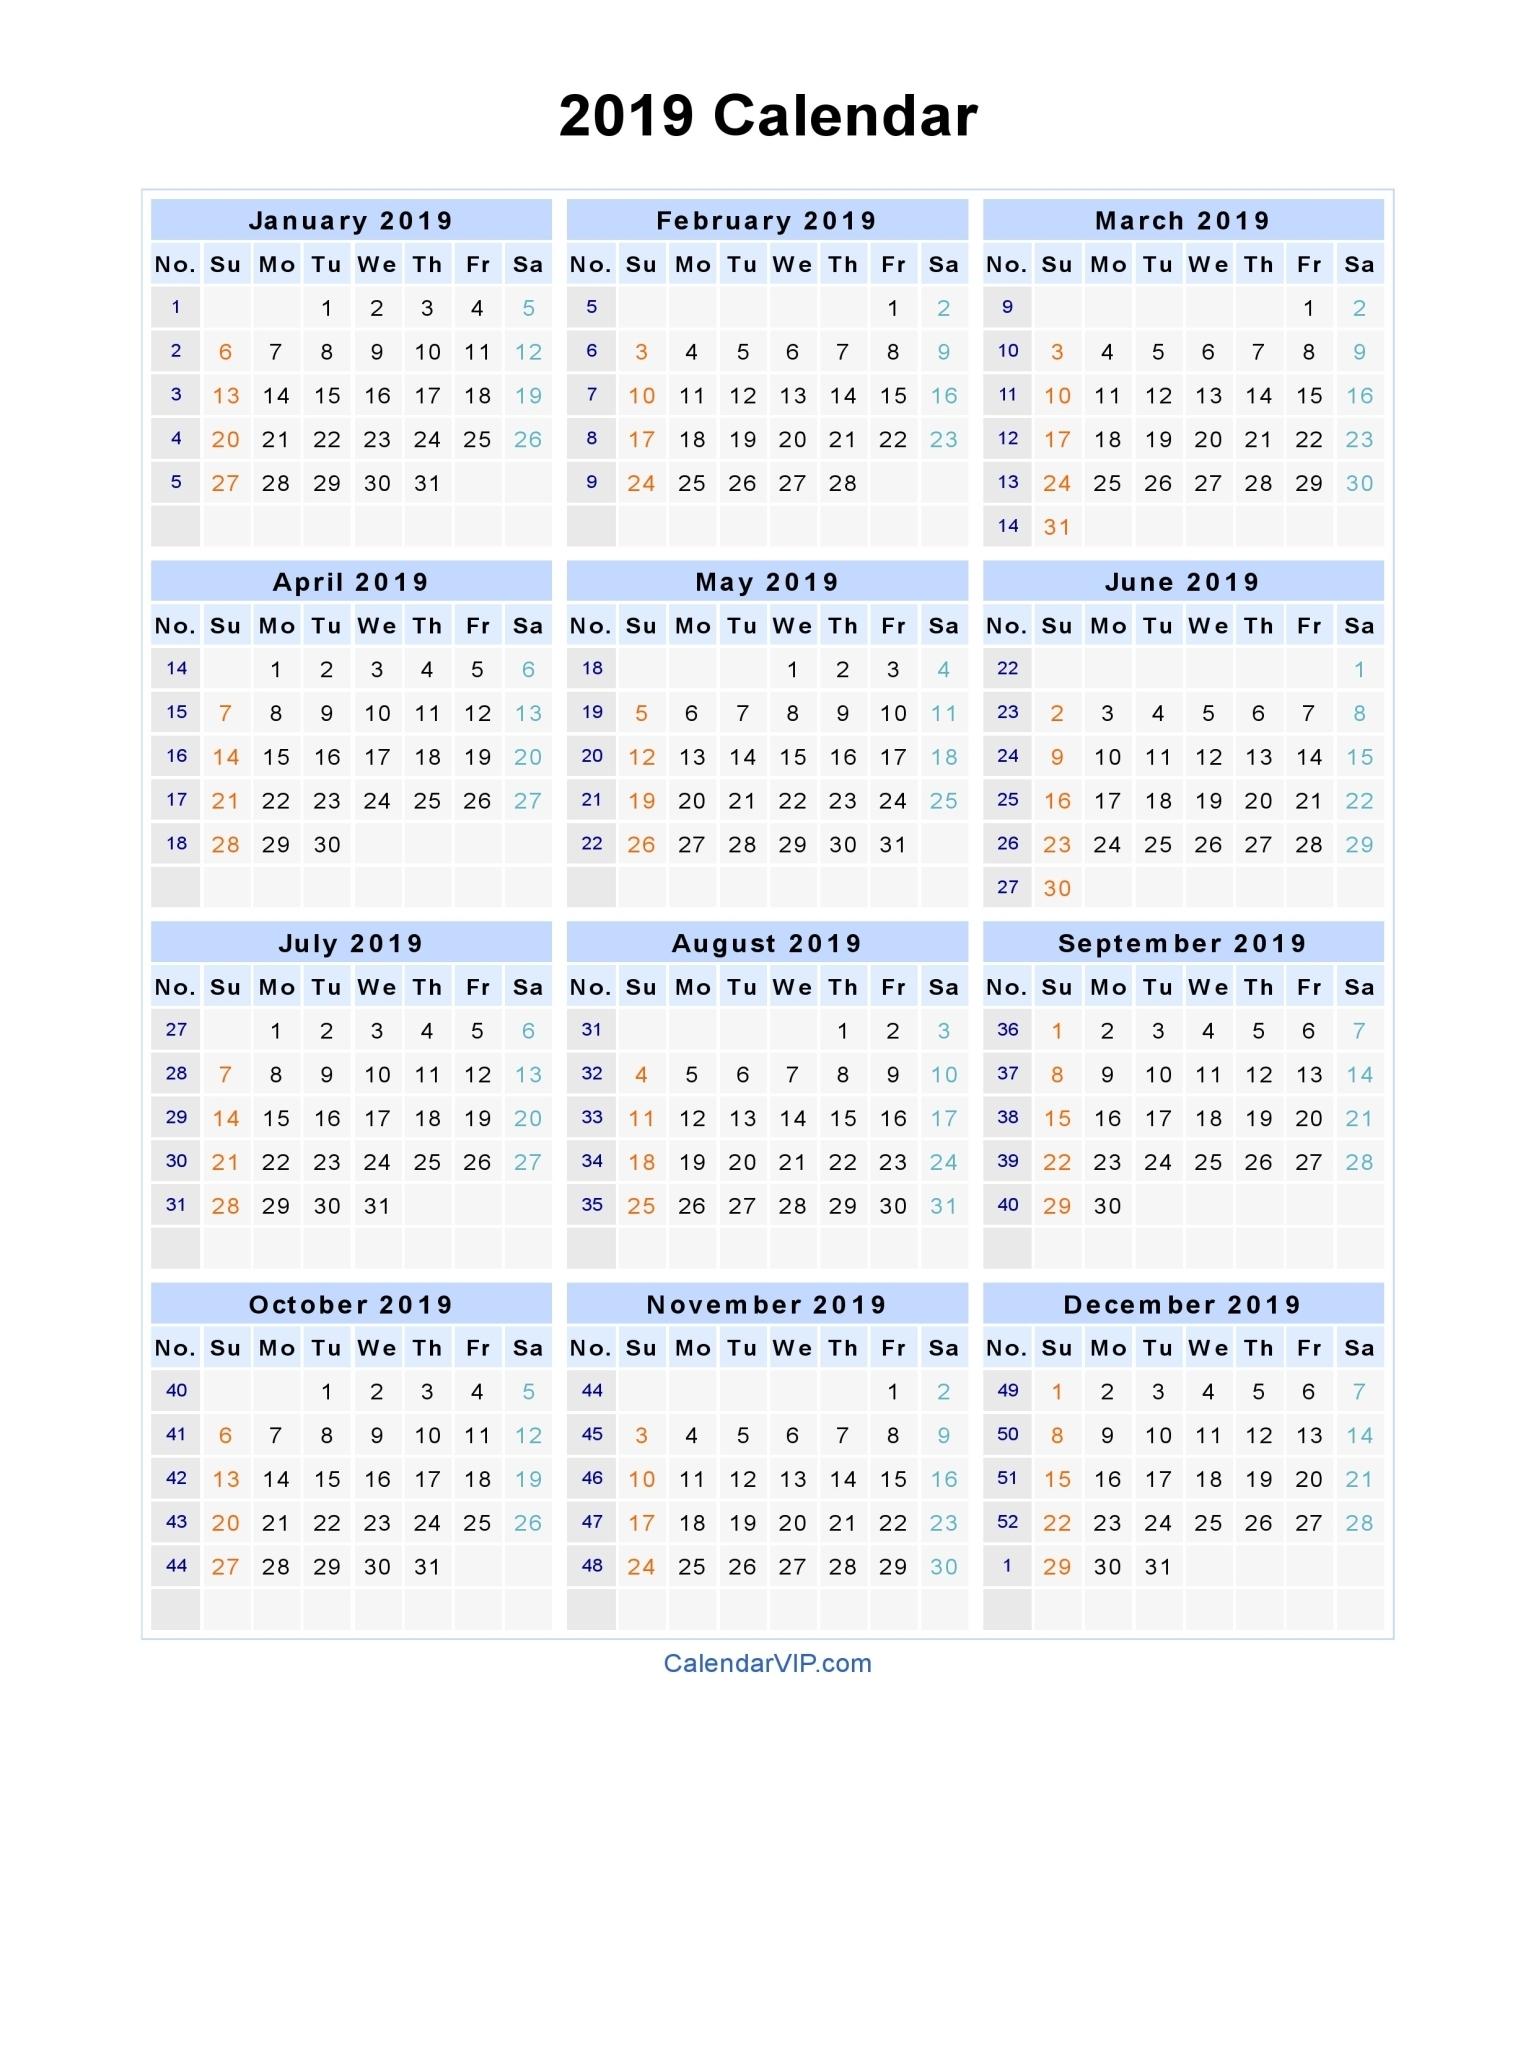 Calendar Labs | 2020 Calendar